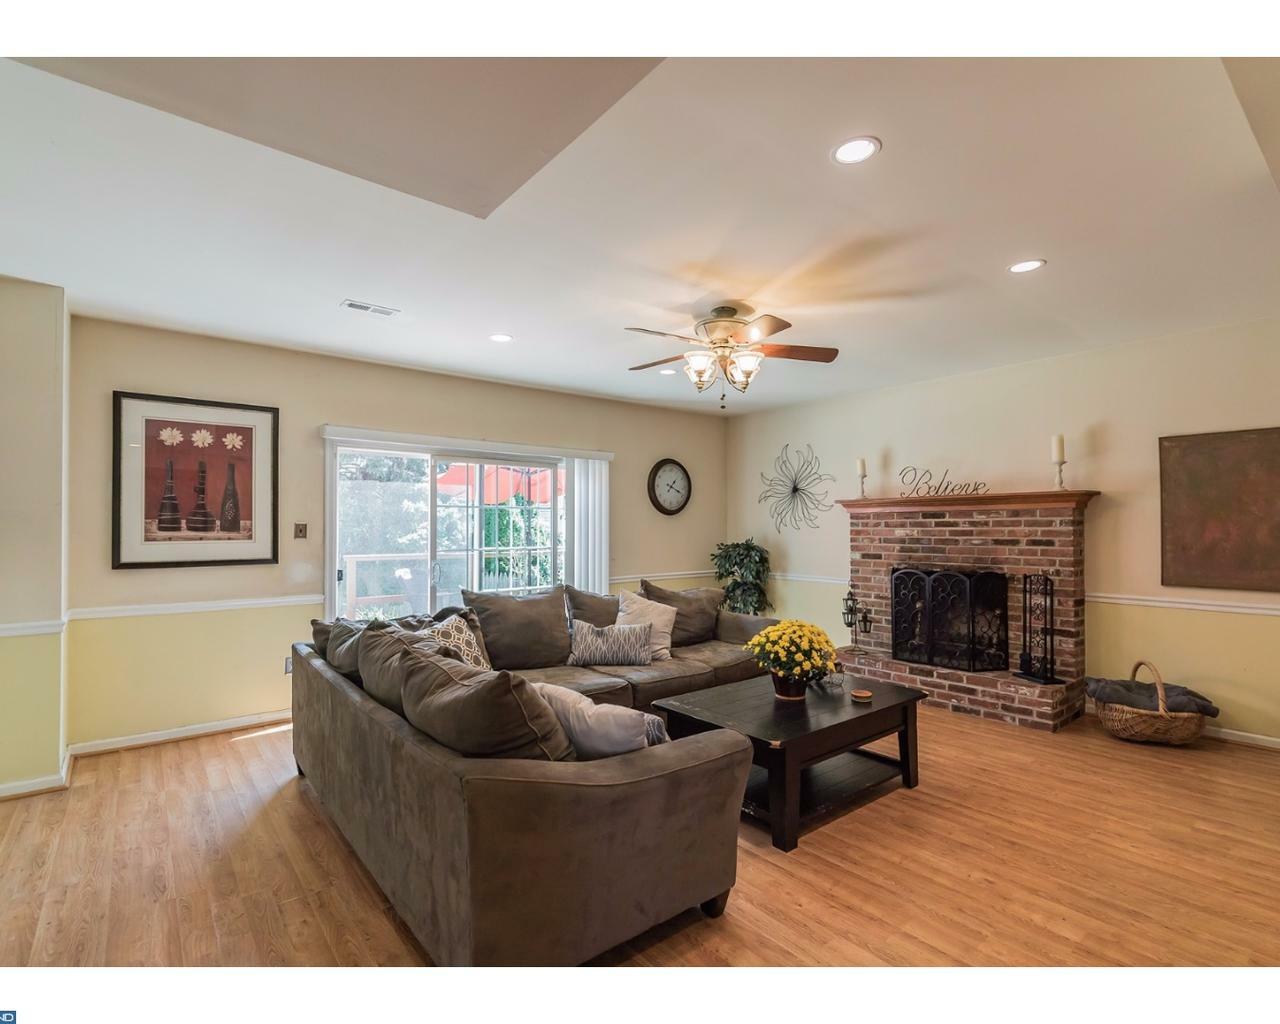 450 Pheasant Ln, Fairless Hills, PA - USA (photo 3)